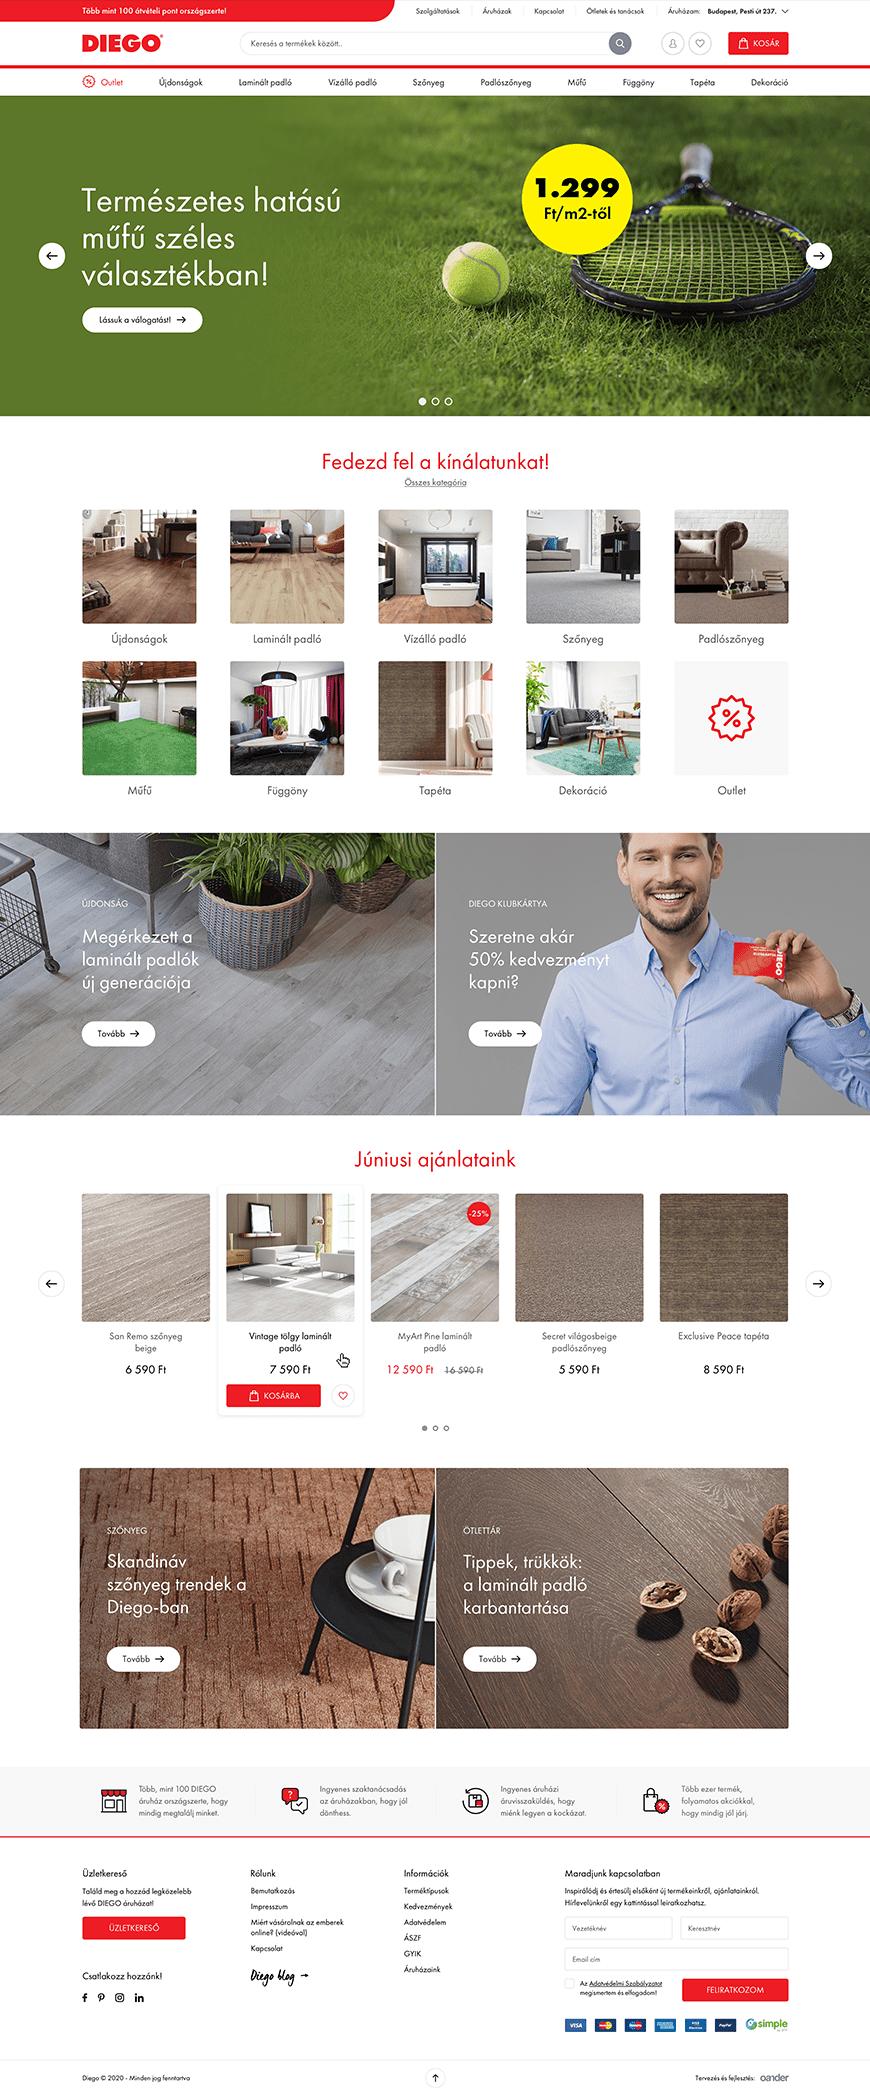 DIEGO web store